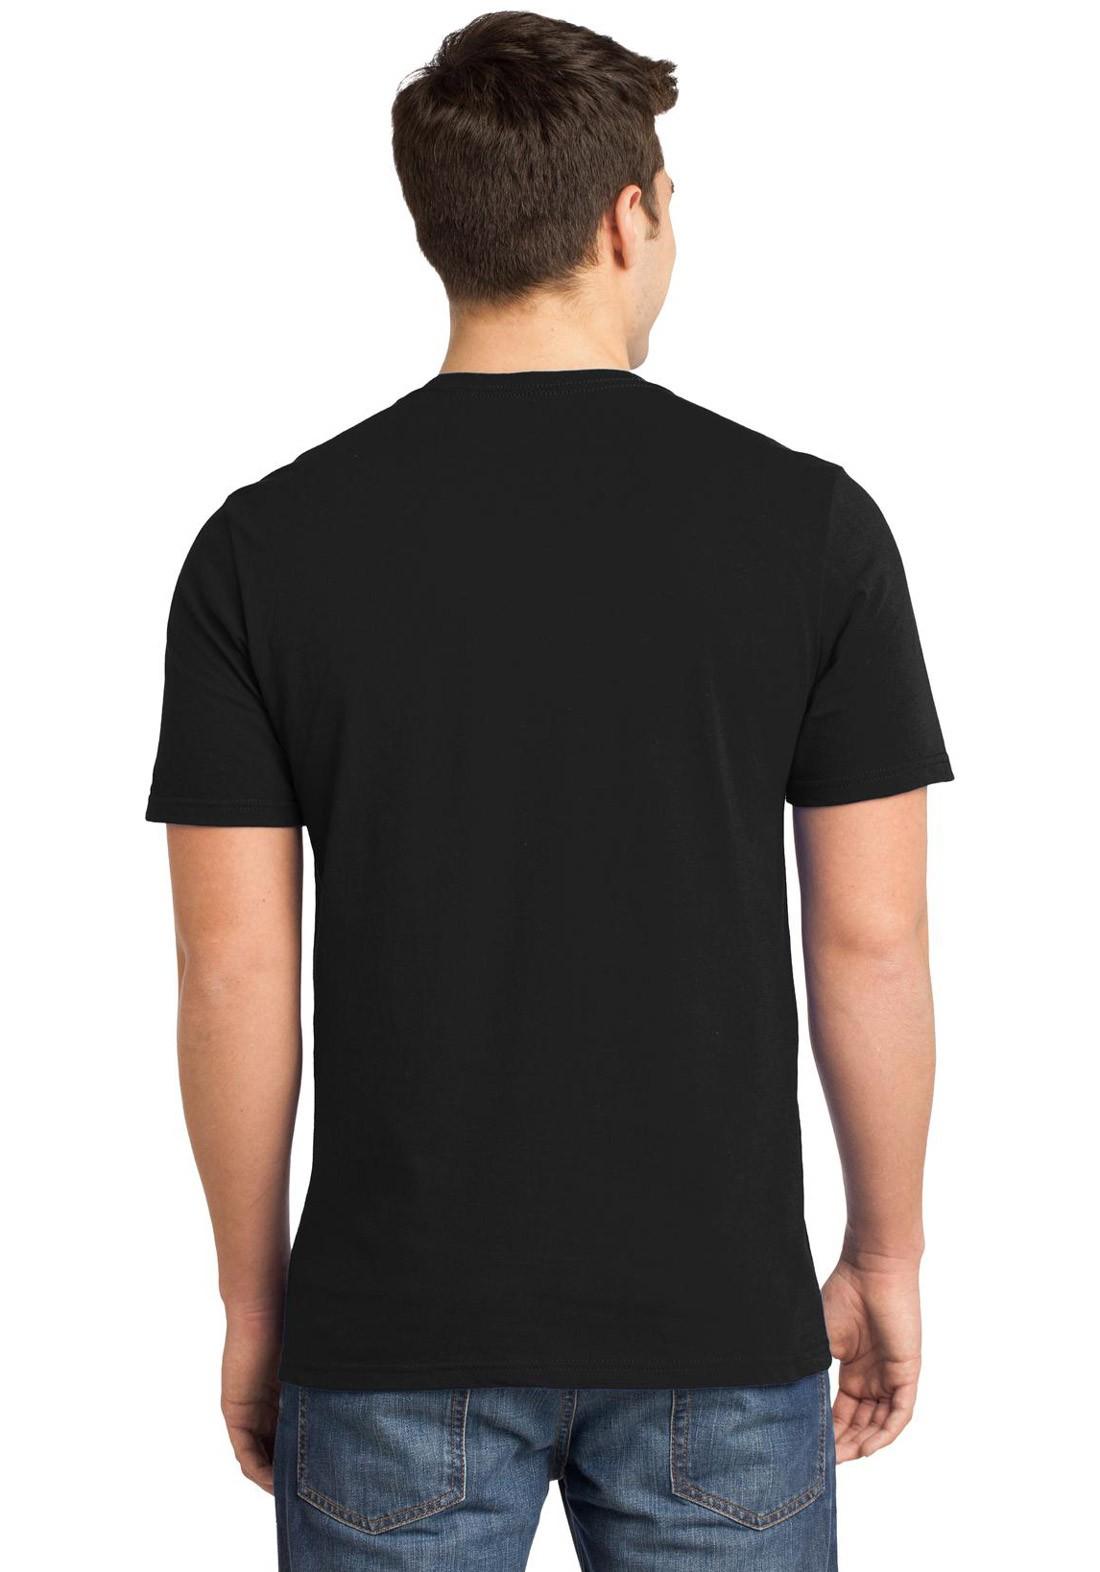 Camiseta Masculina Universitária Faculdade Turismo